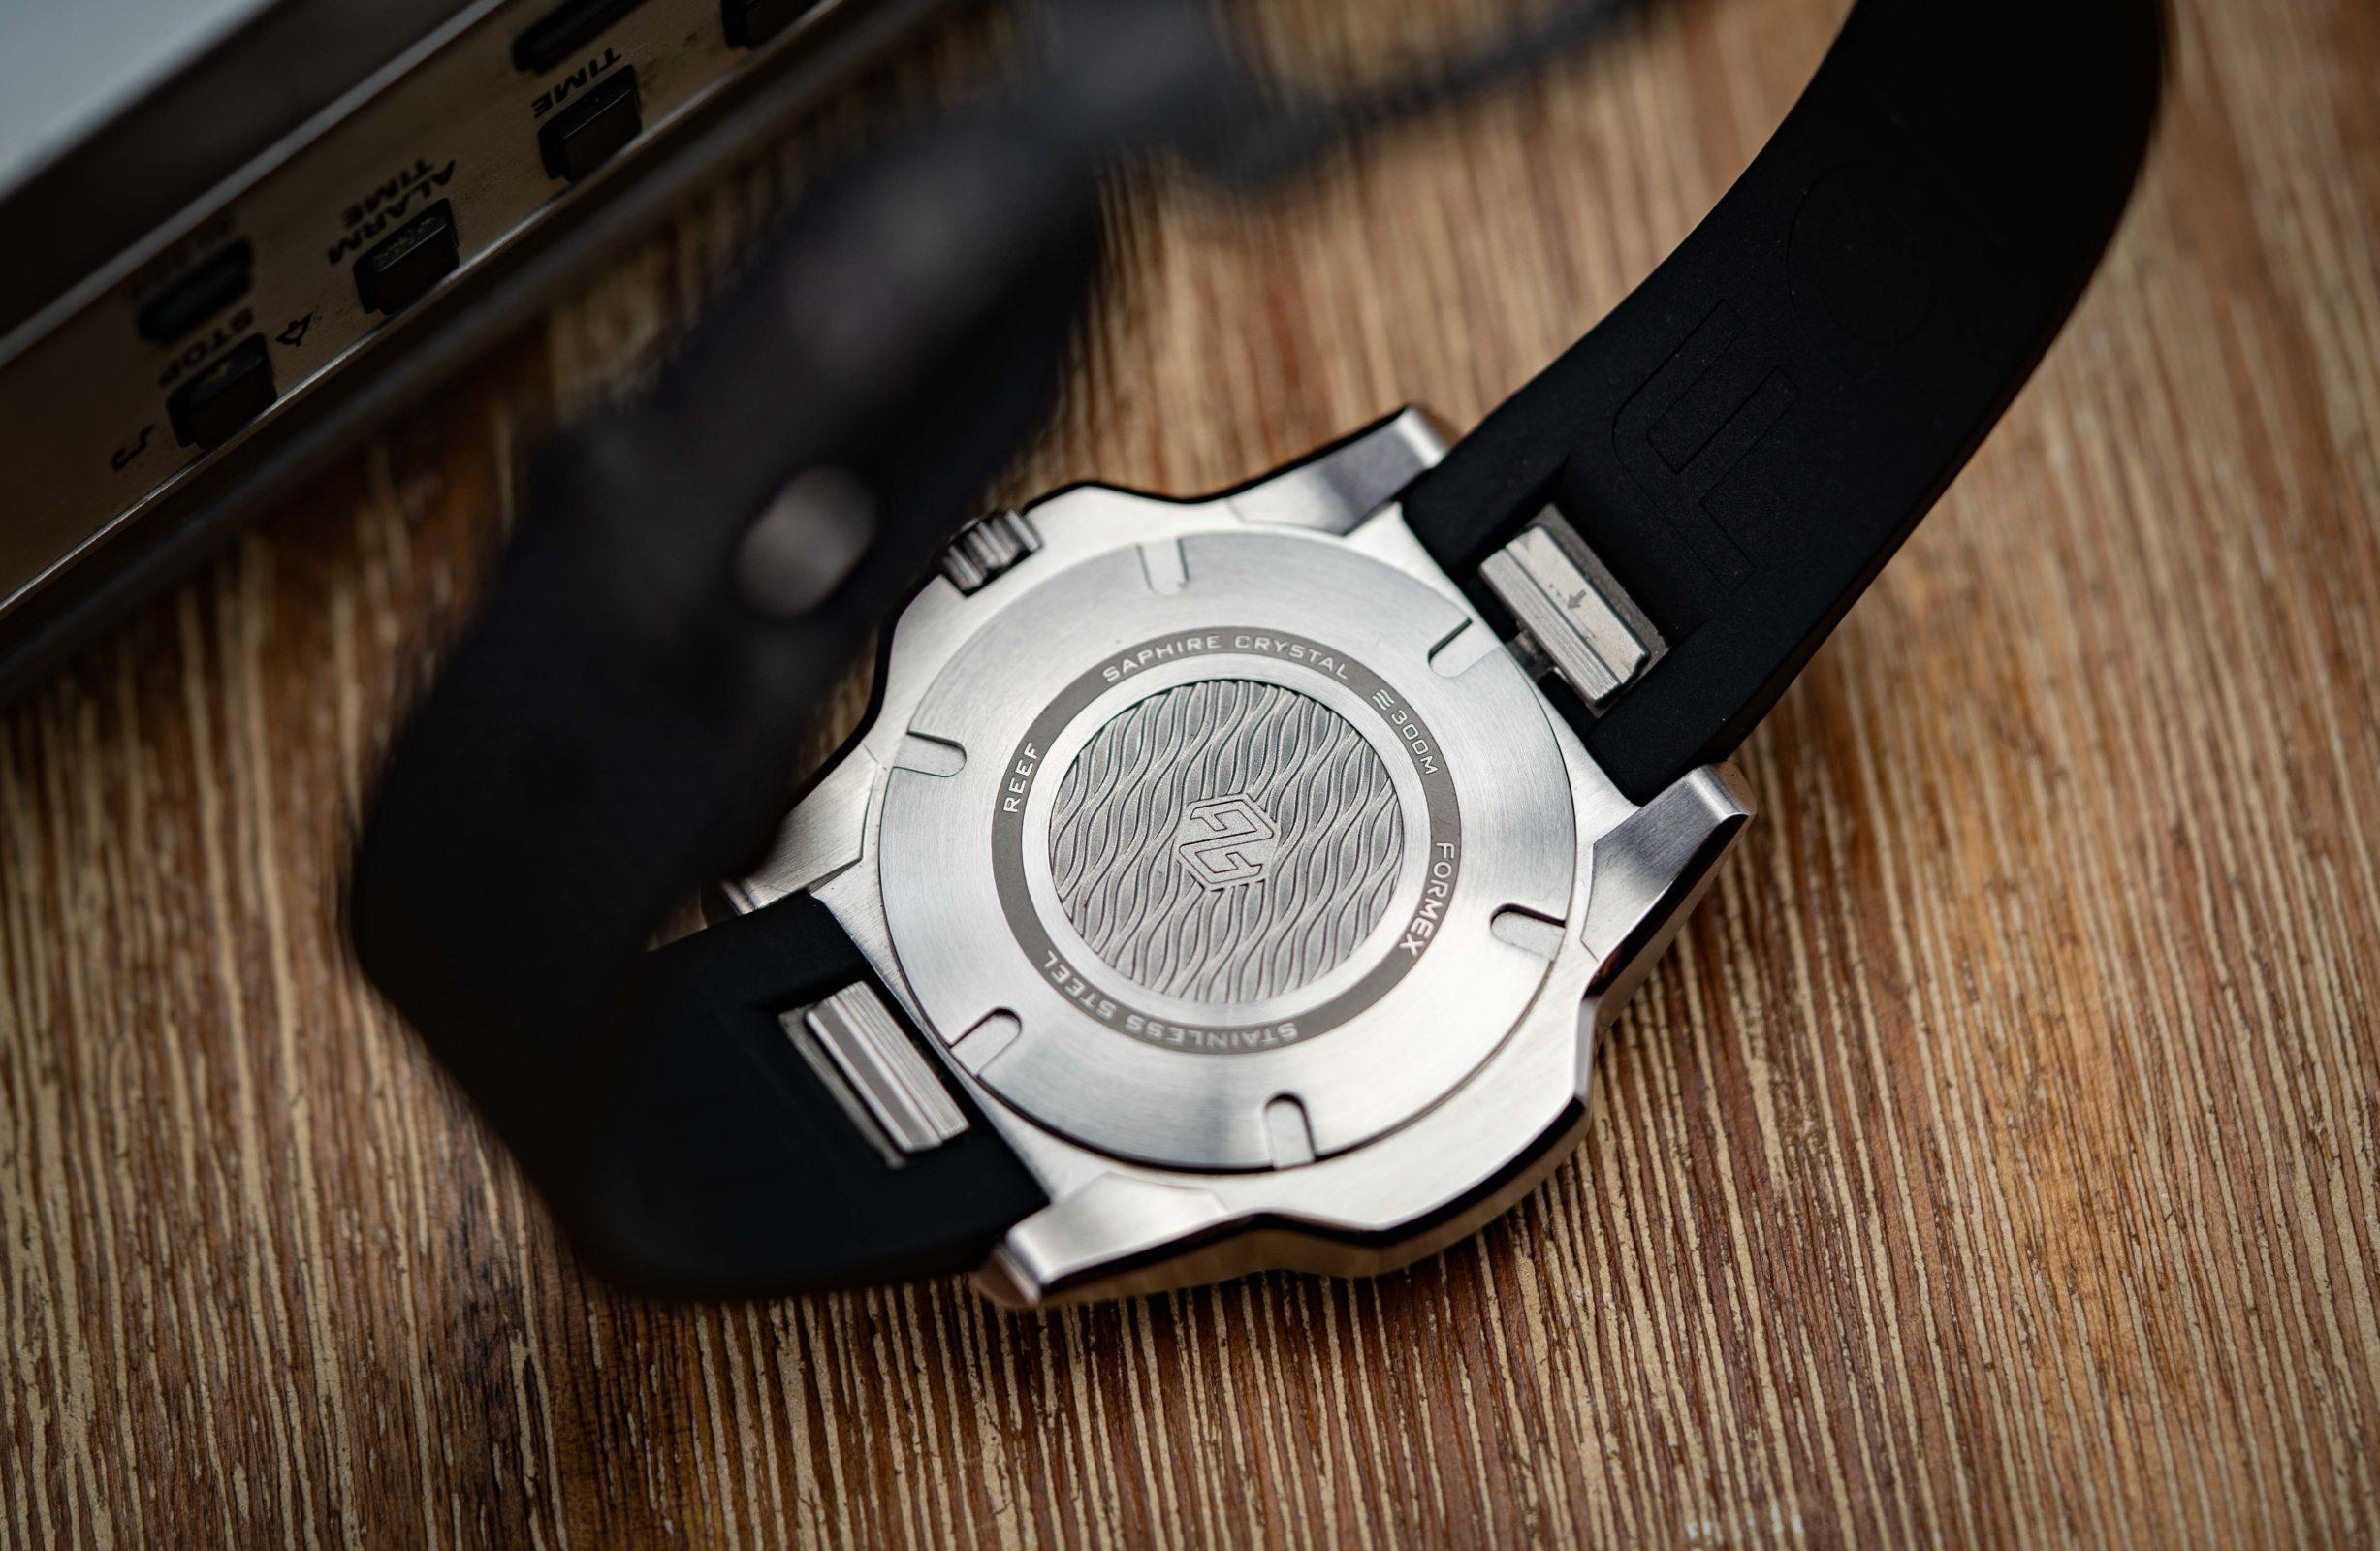 Formex-Reef-Automatik-Chronometer-300m-9